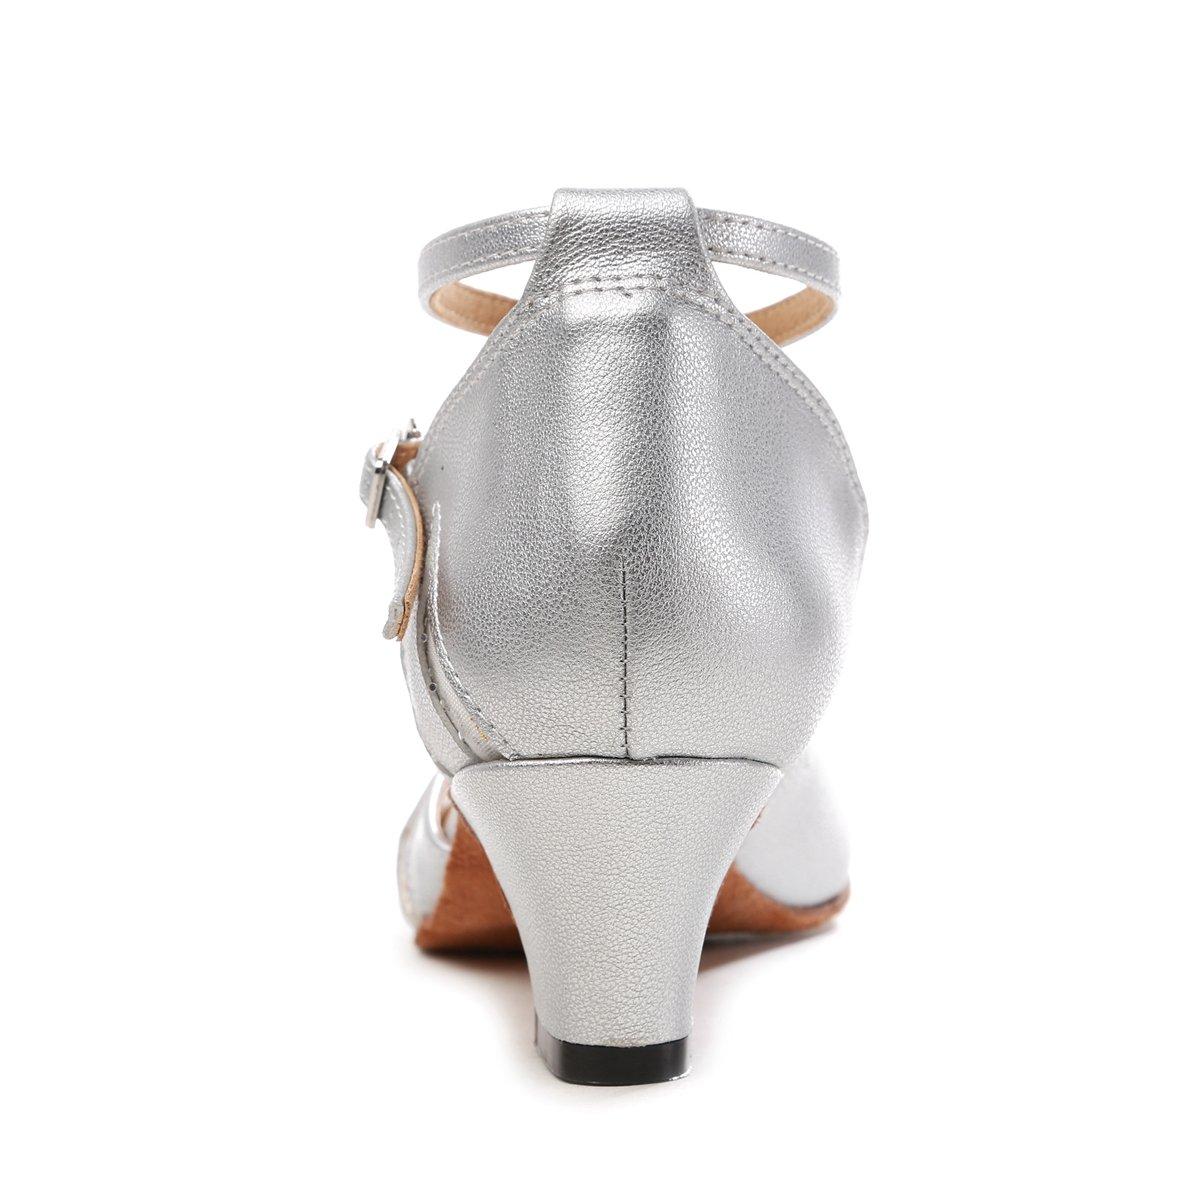 Minishion GL261 Women's Closed Toe Mesh Latin Synthetic Salsa Latin Mesh Dance Shoes Party Pumps B078GGDQJ1 Dance 3ce371